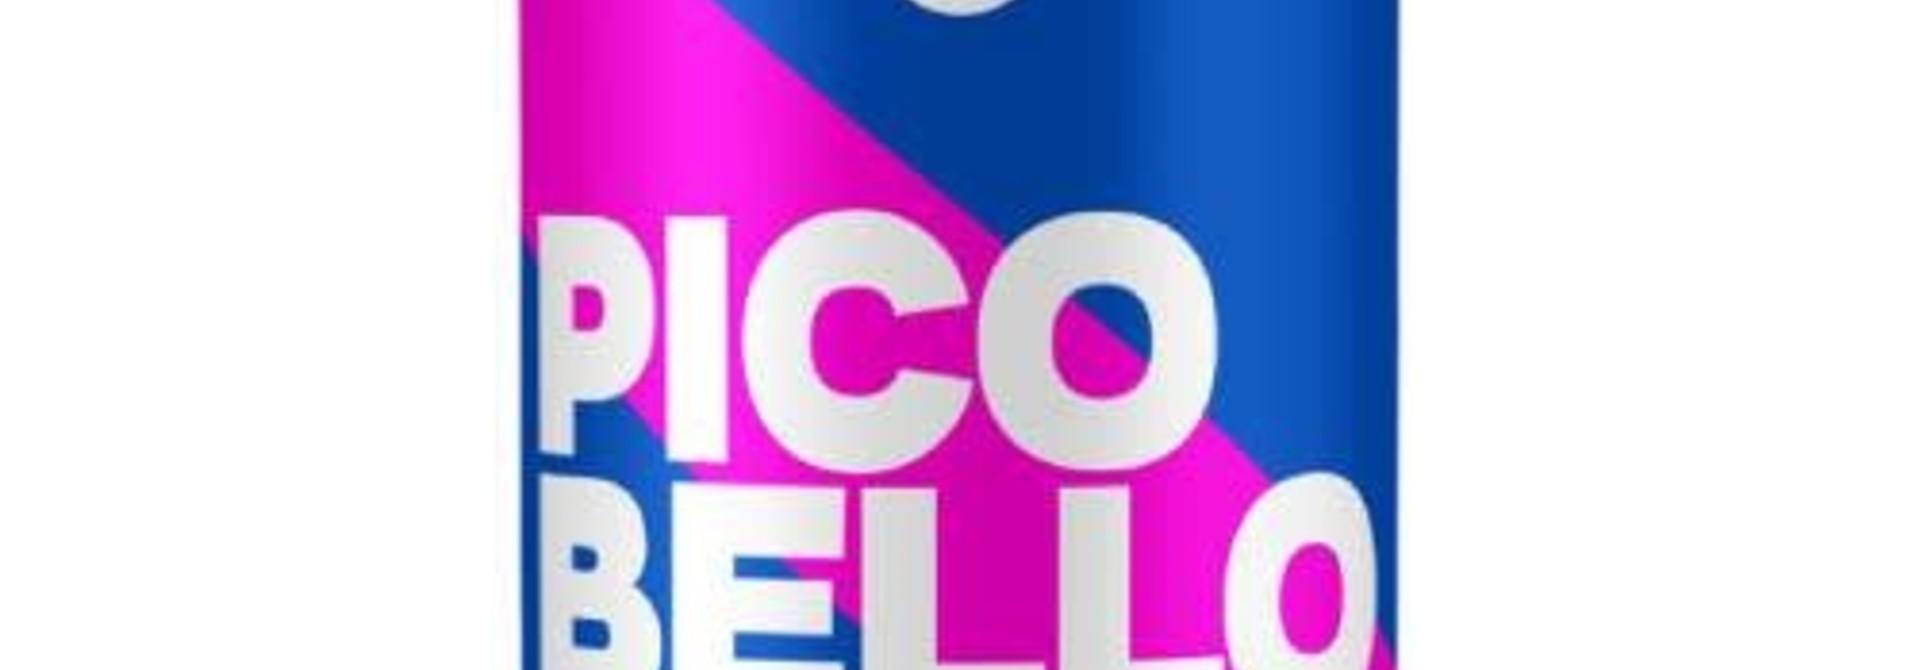 BRUS. BEER PROJECT - PICO BELLO